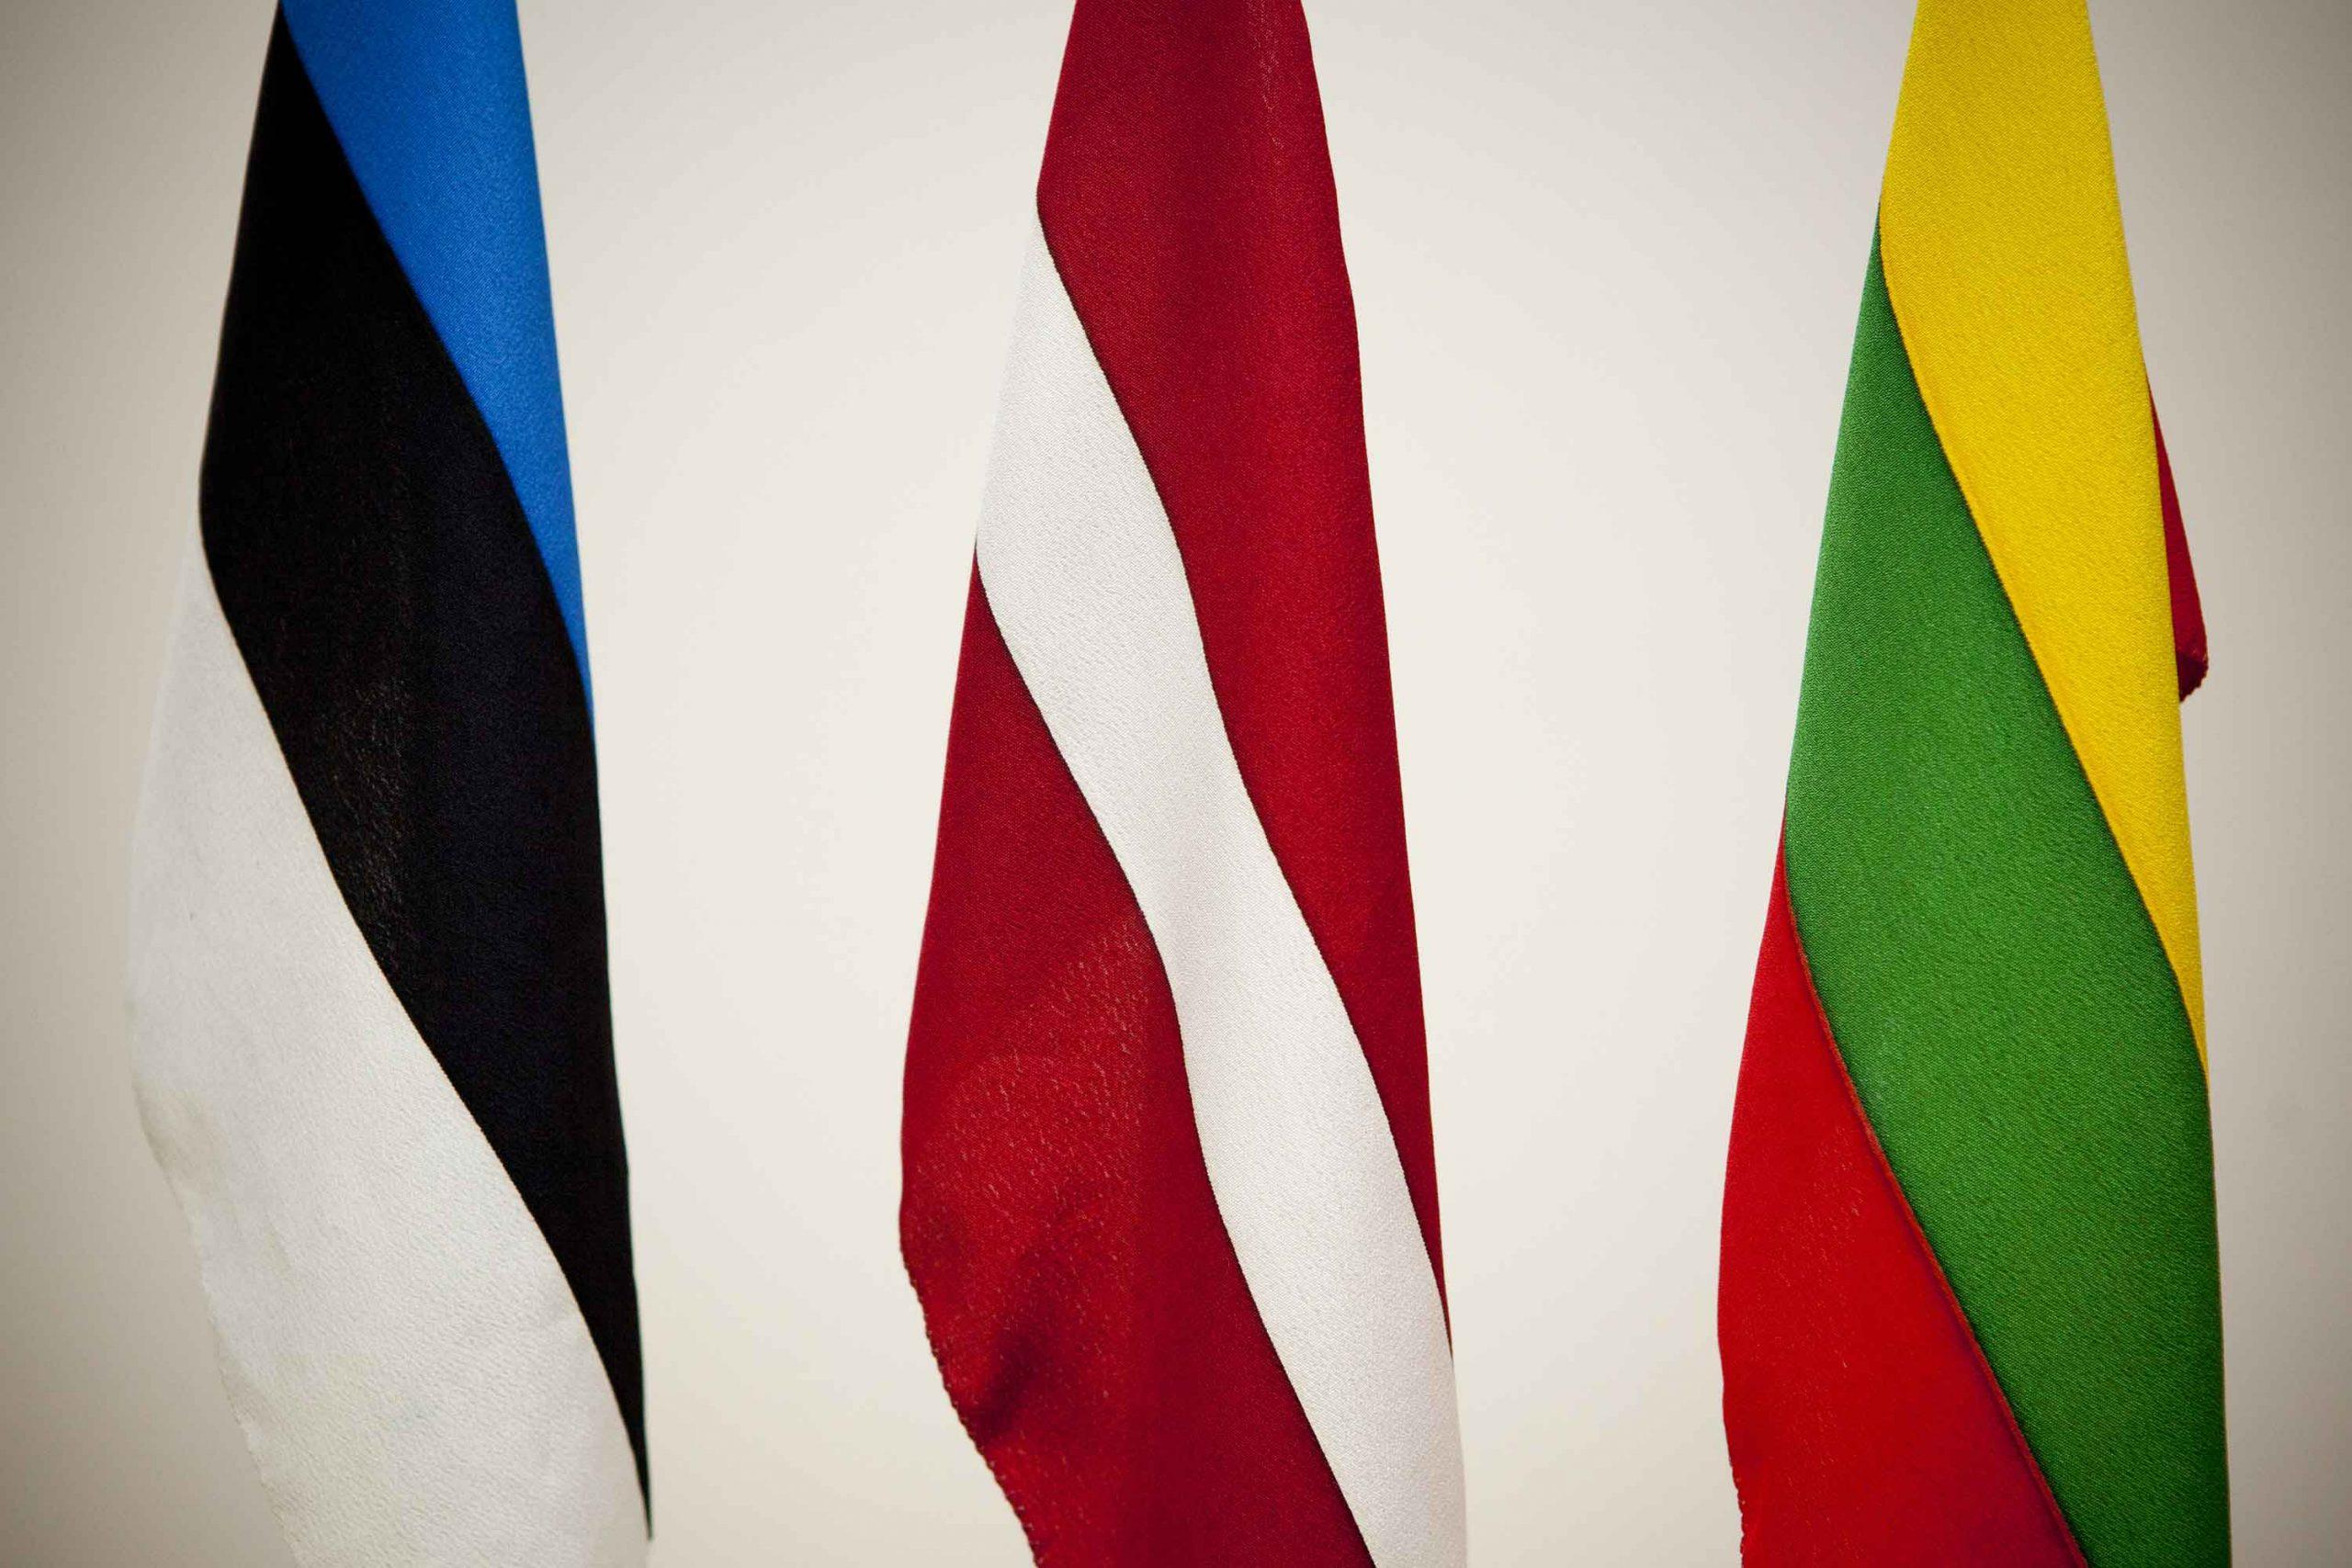 Baltikum domännamn, .EE, .LV, .LT, Estland, Lettland, Litauen